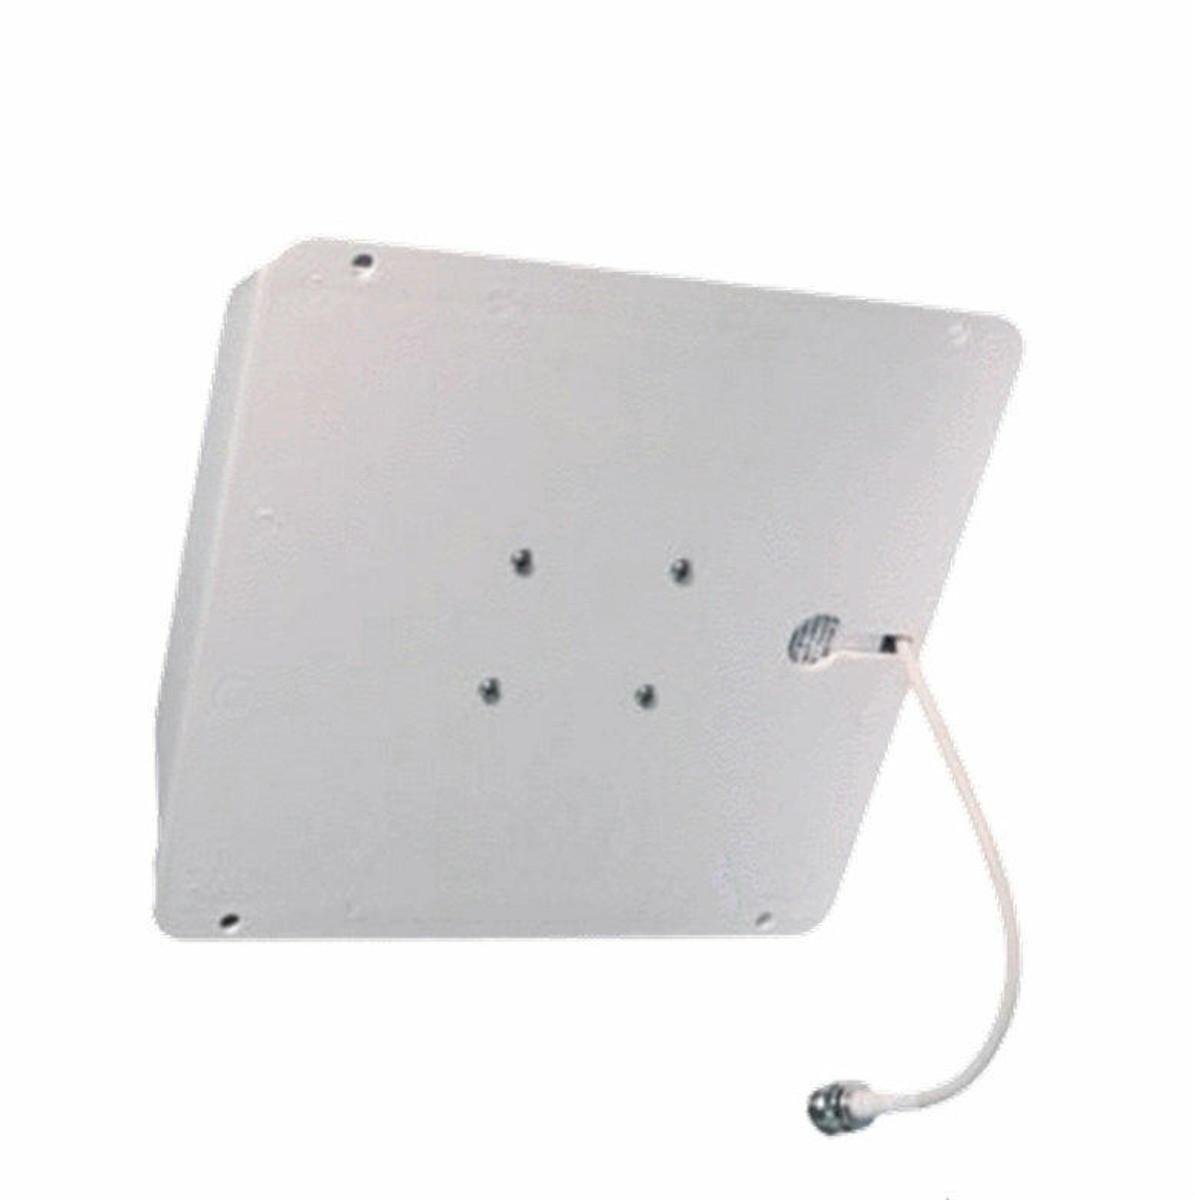 Wilson Electronics weBoost Wilson 901140 Ceiling Mount for Panel Antennas